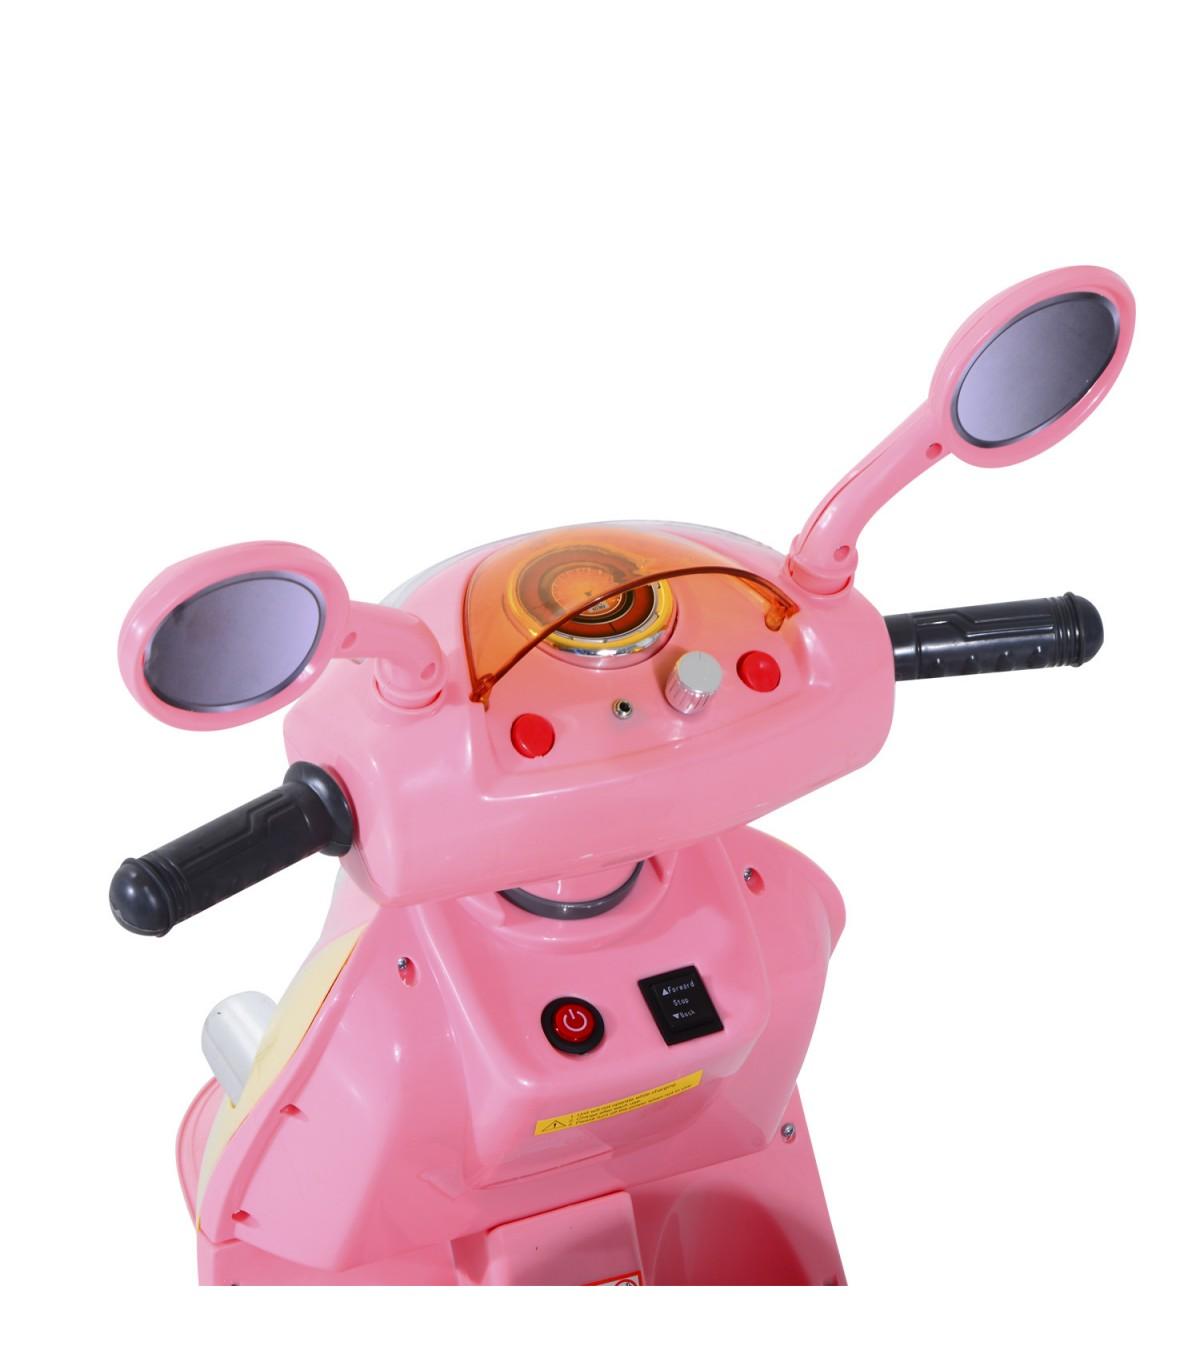 3fd3a4ceb5a8e HomCom® Coche Triciclo Moto Eléctrica Infantil Correpasillos a Batería  Niños 3-8 años 108x51x75cm Rosa